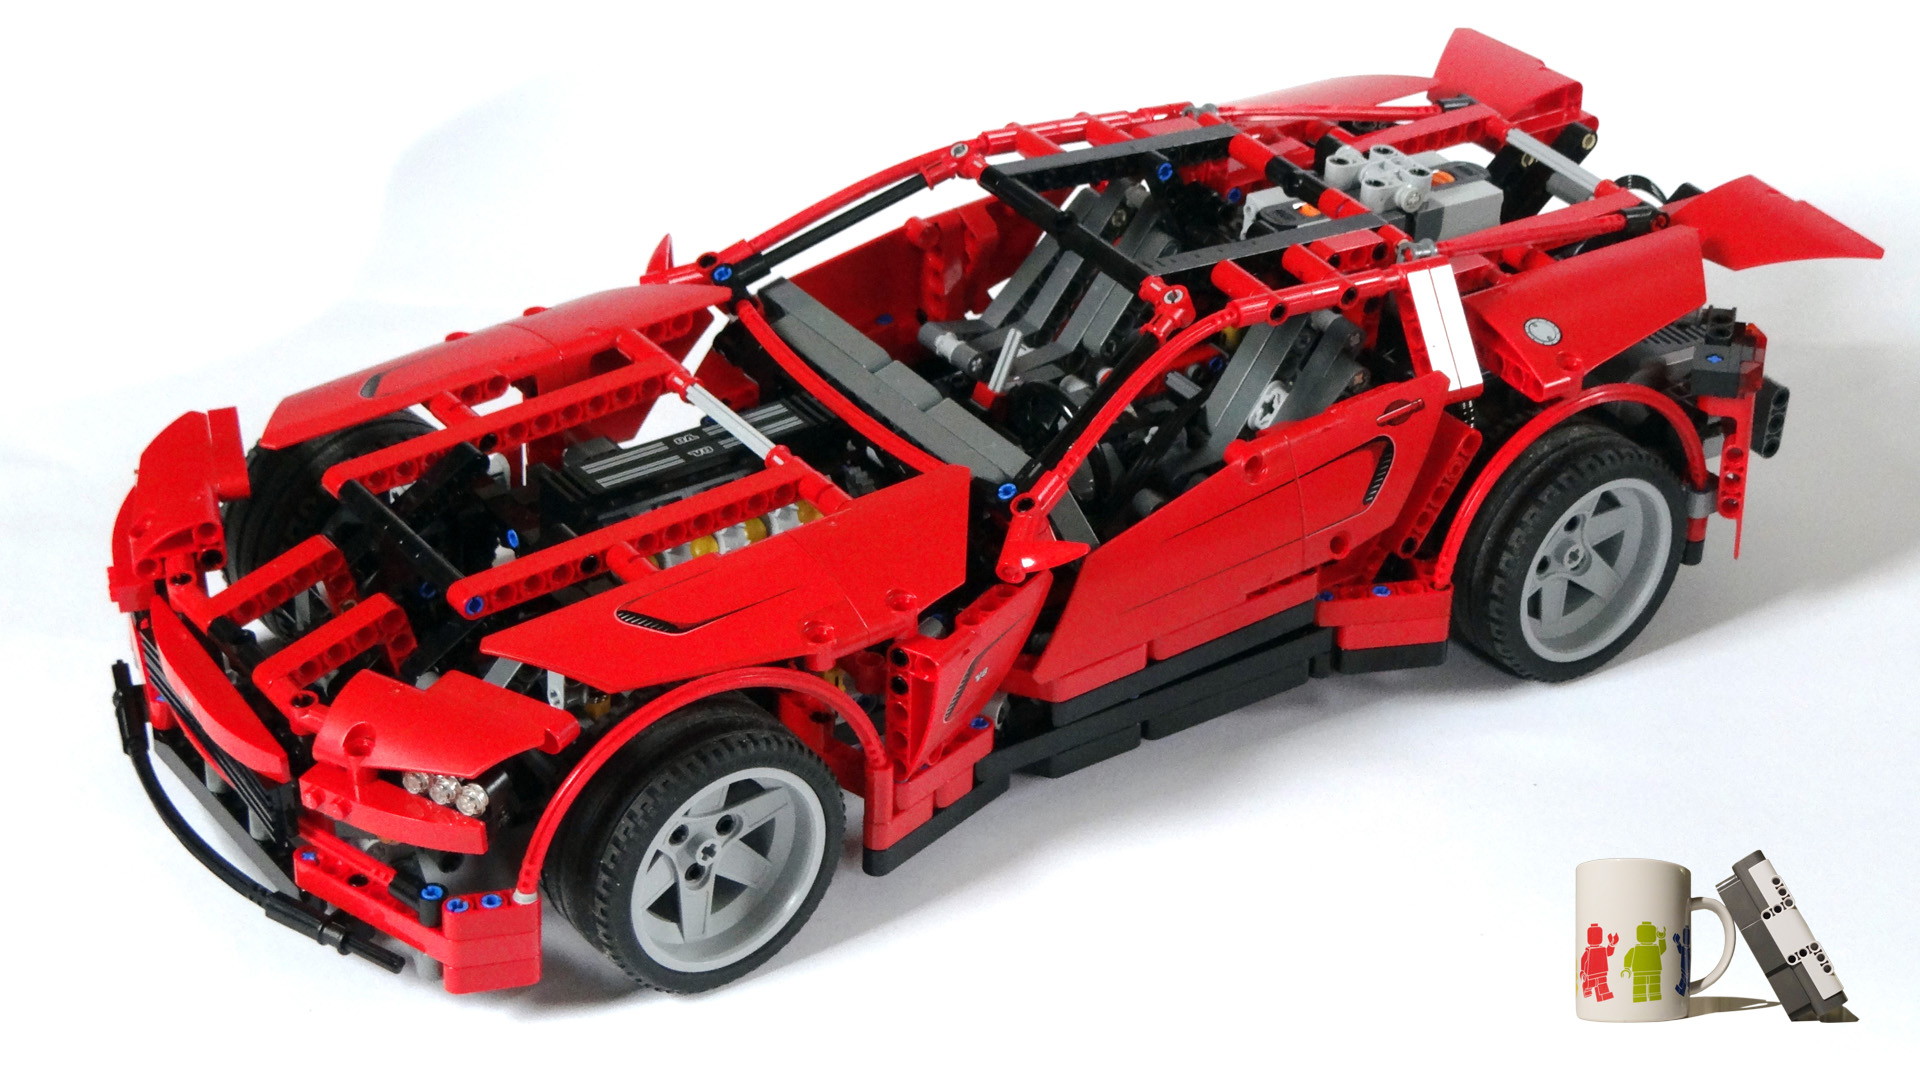 lego technic 2 in 1 super red sports car 8070 rare bnisb free gift ebay. Black Bedroom Furniture Sets. Home Design Ideas